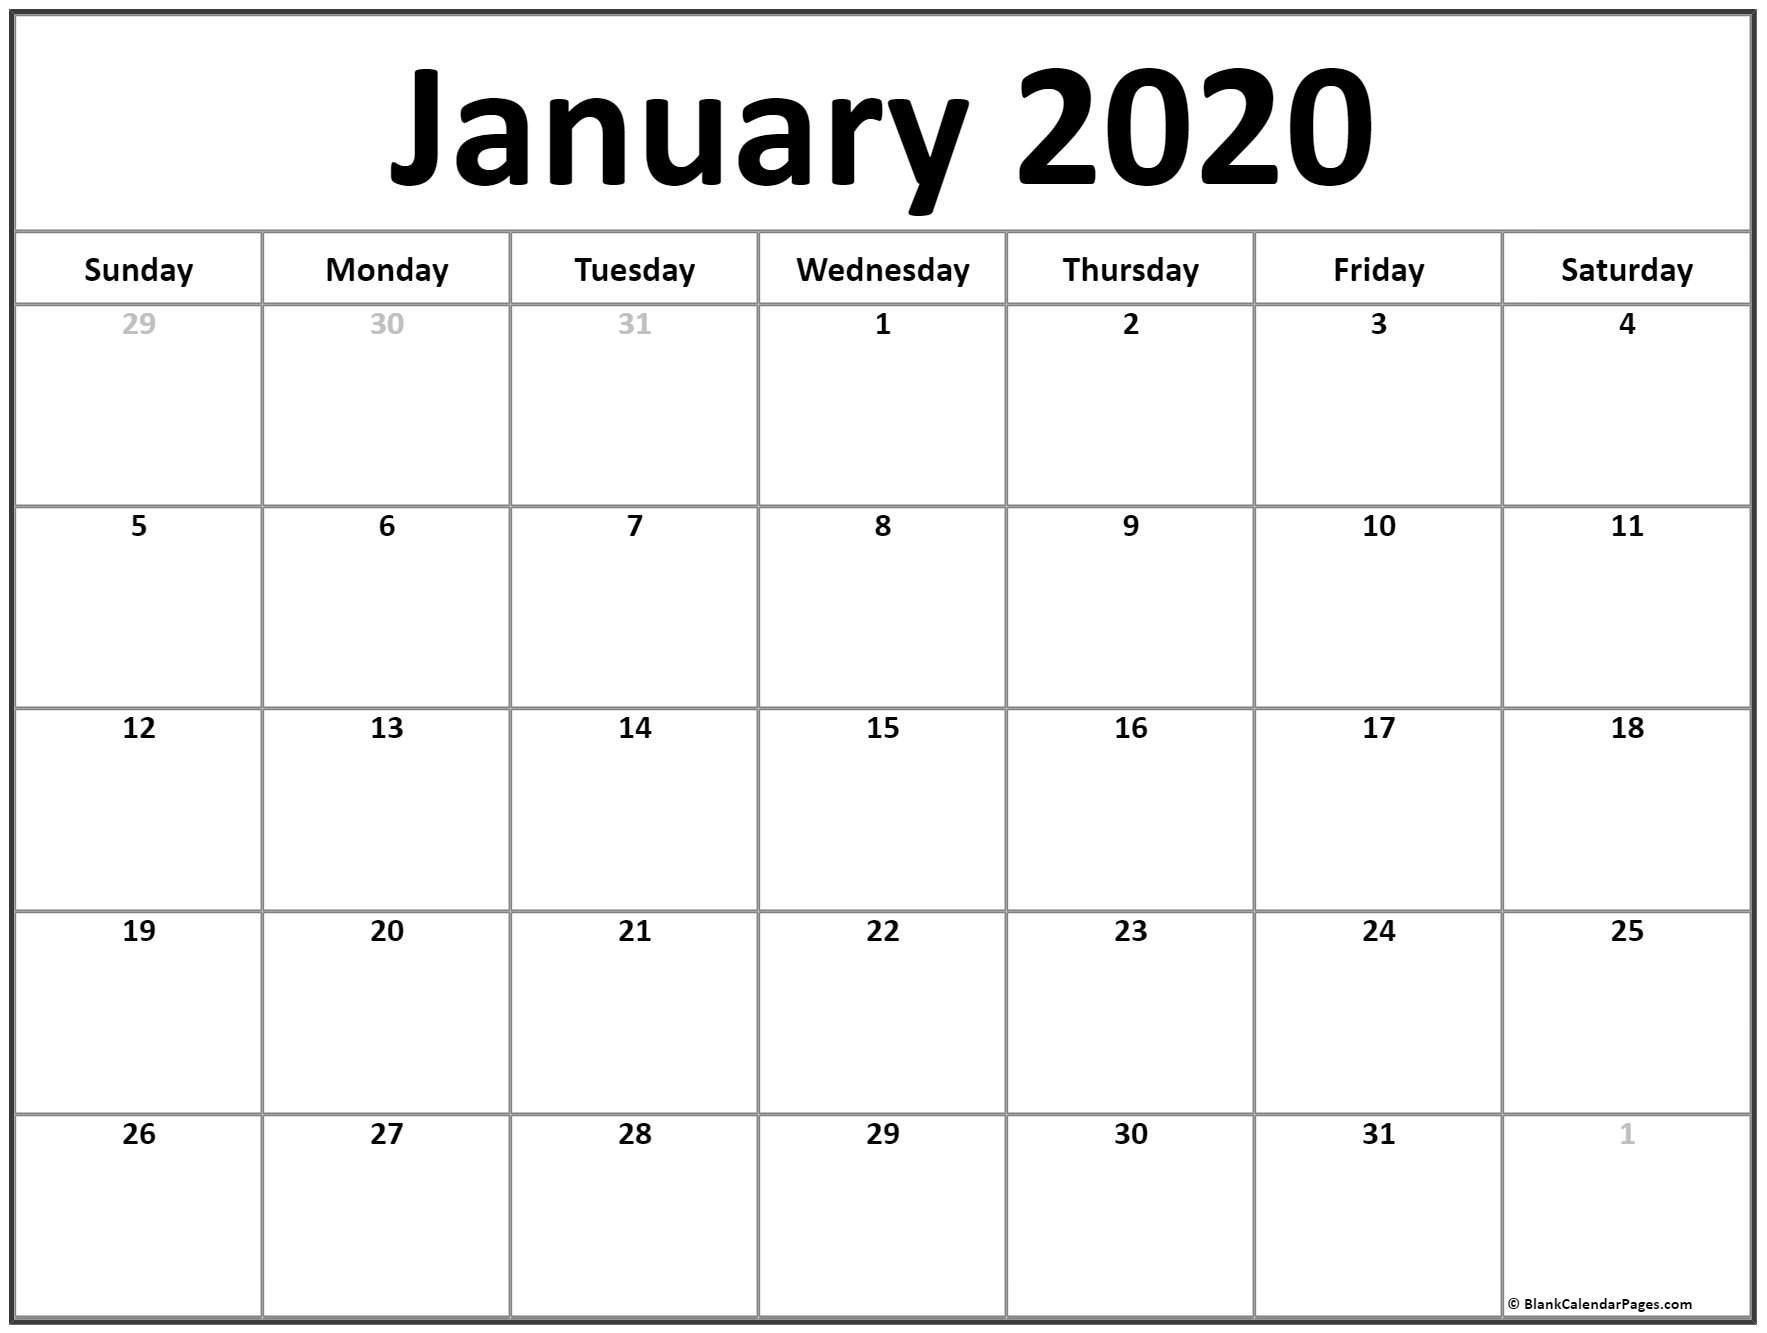 Blank Monthly Calendar Printable 8.5 X 11 | Monthly Free 8 1/2 By 11 Blank Calendar